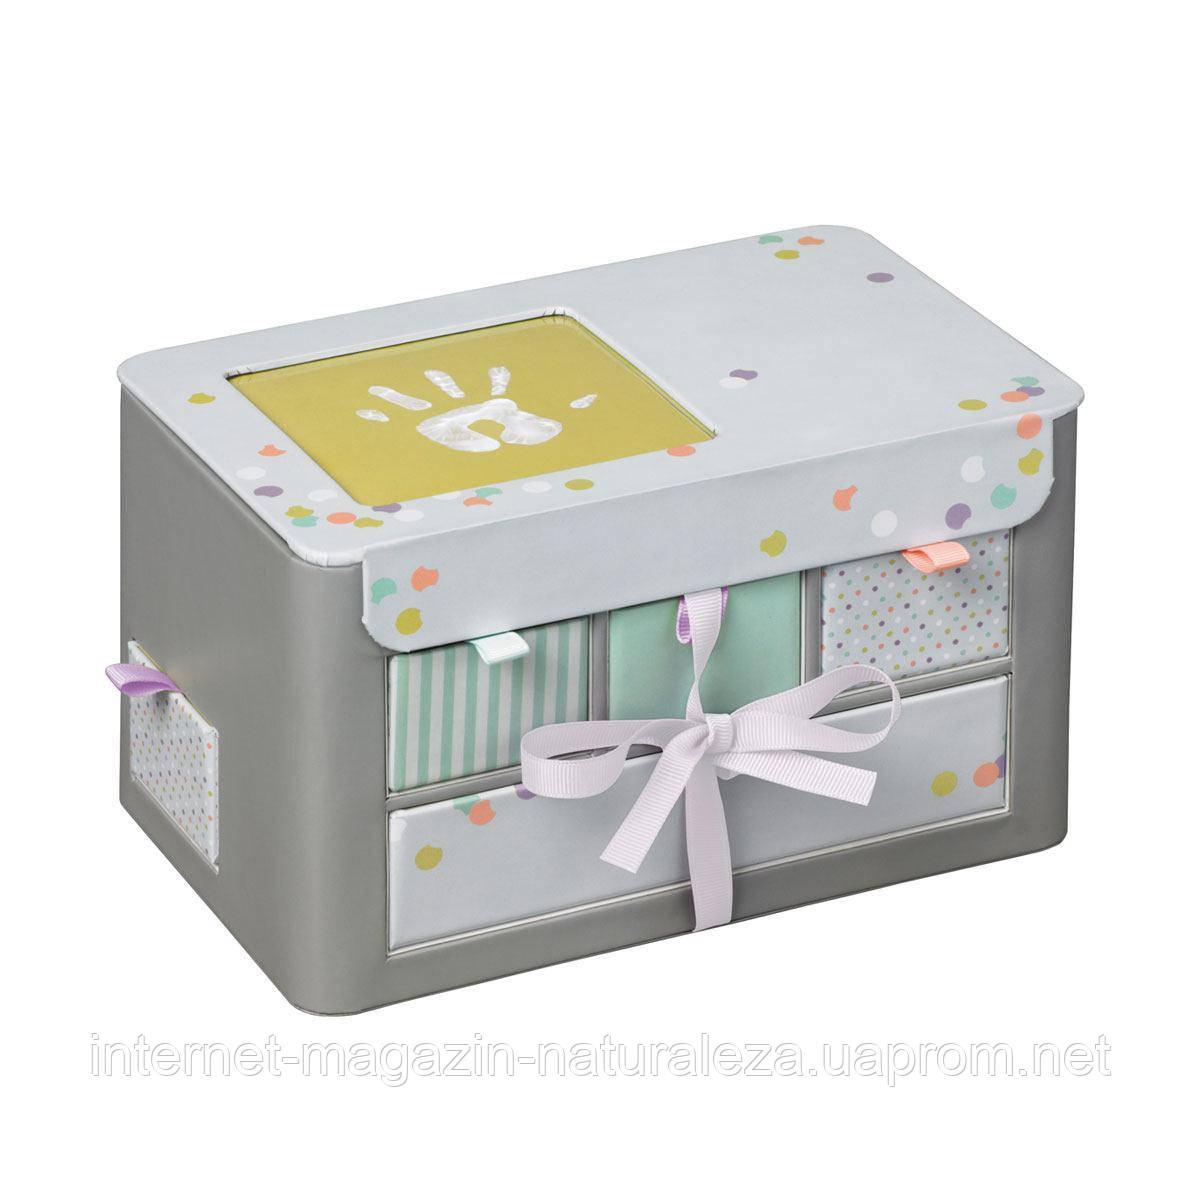 Подарок новорожденному Baby Art Шкатулка памяти Treasures Box New!